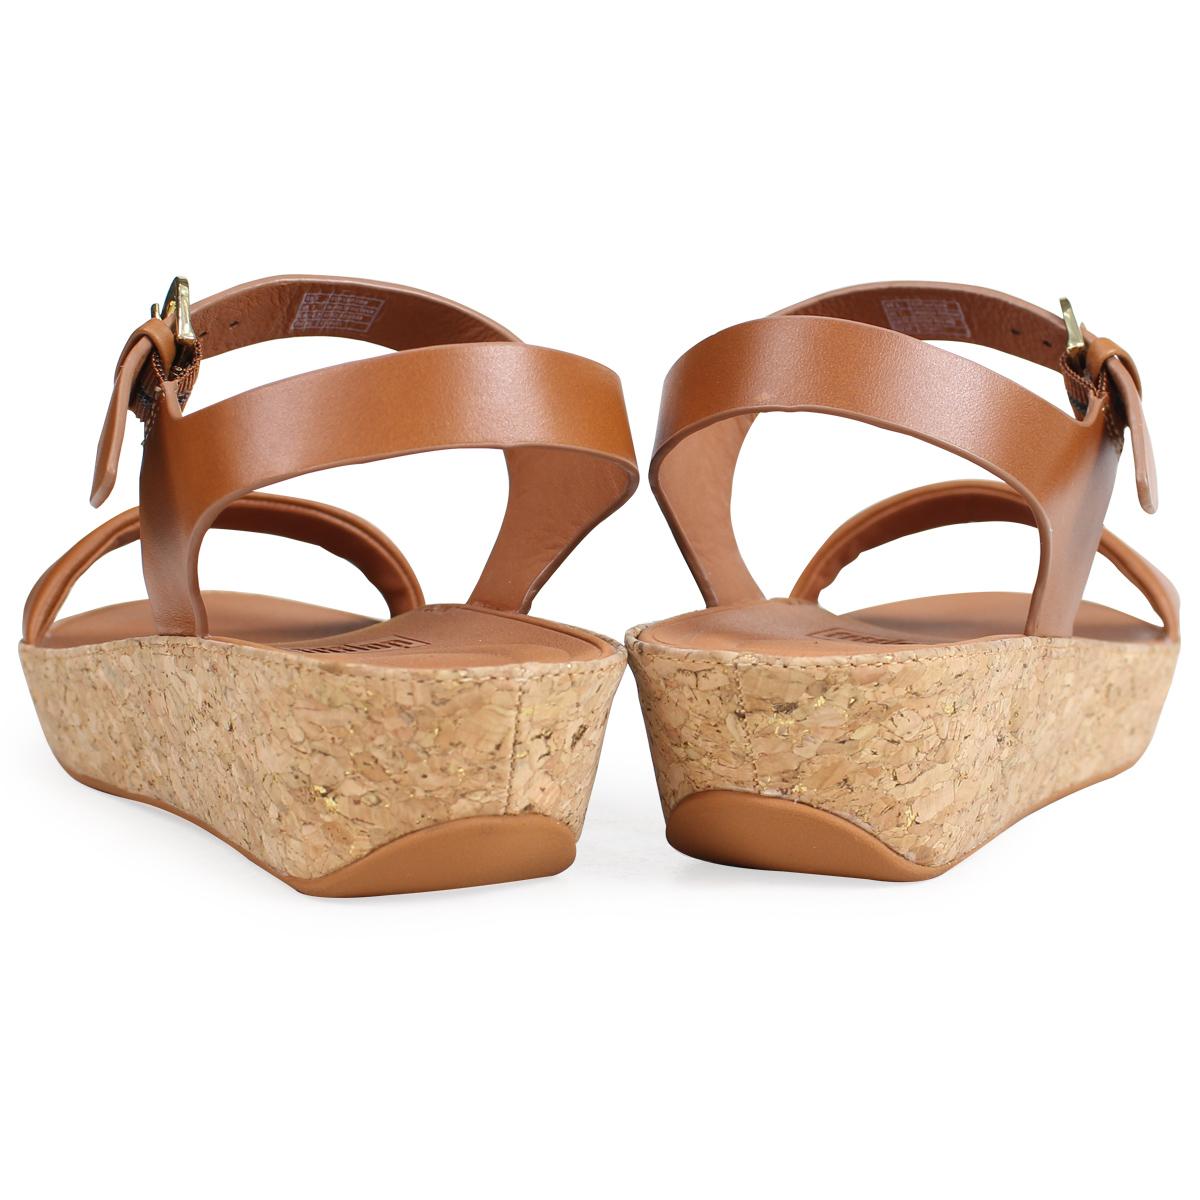 46db48bcc8e SneaK Online Shop  FitFlop sandals fitting FLOP 2